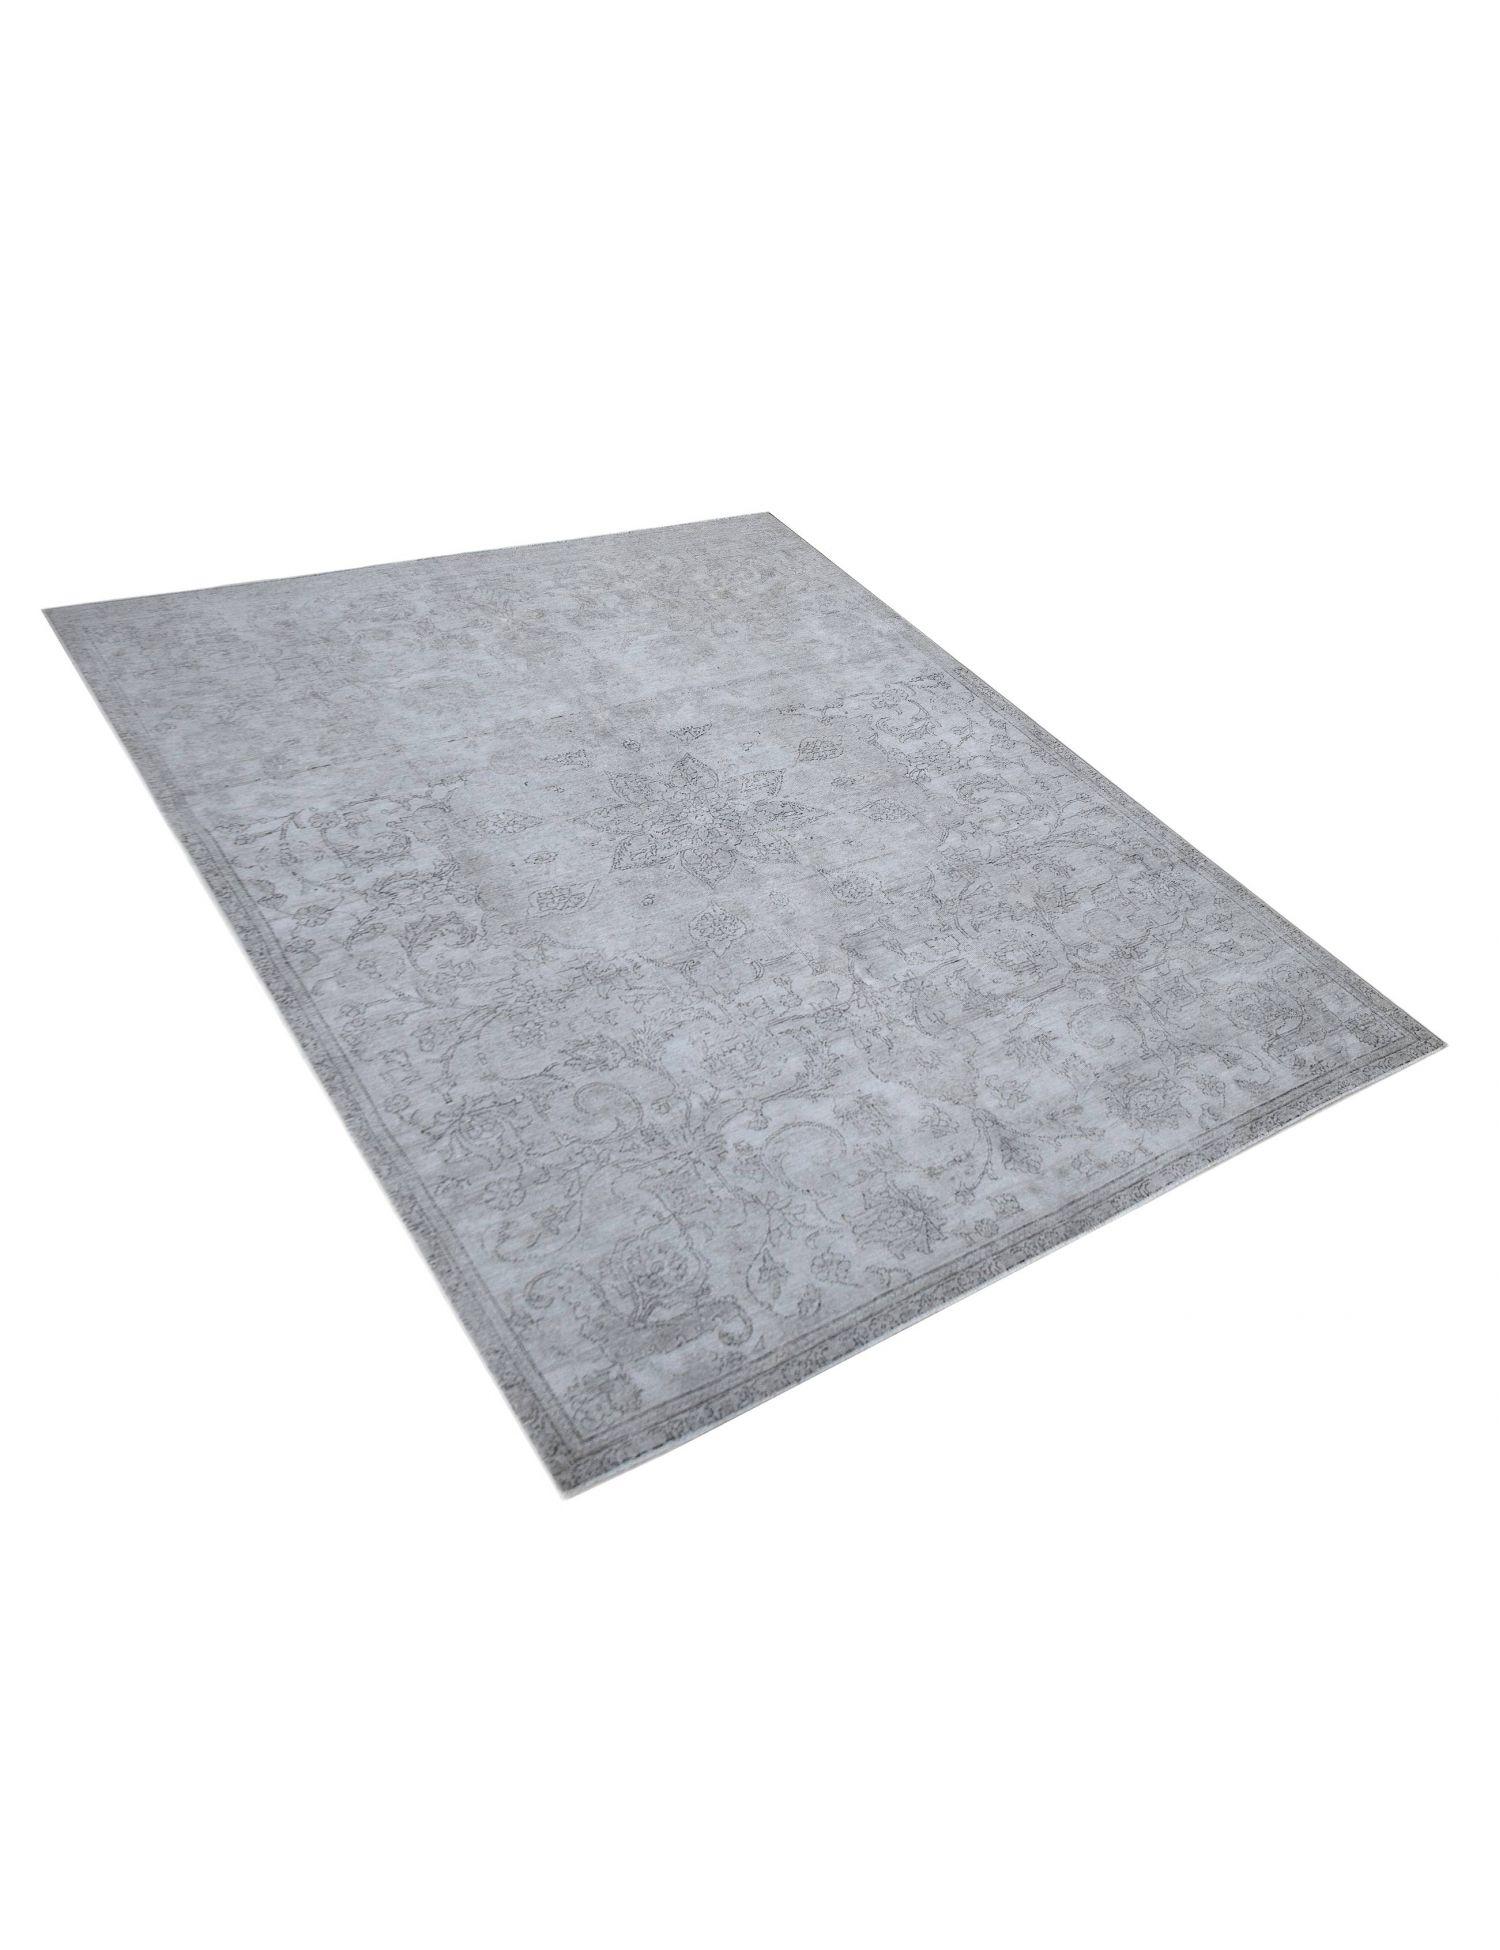 Vintage Perserteppich  grau <br/>310 x 215 cm